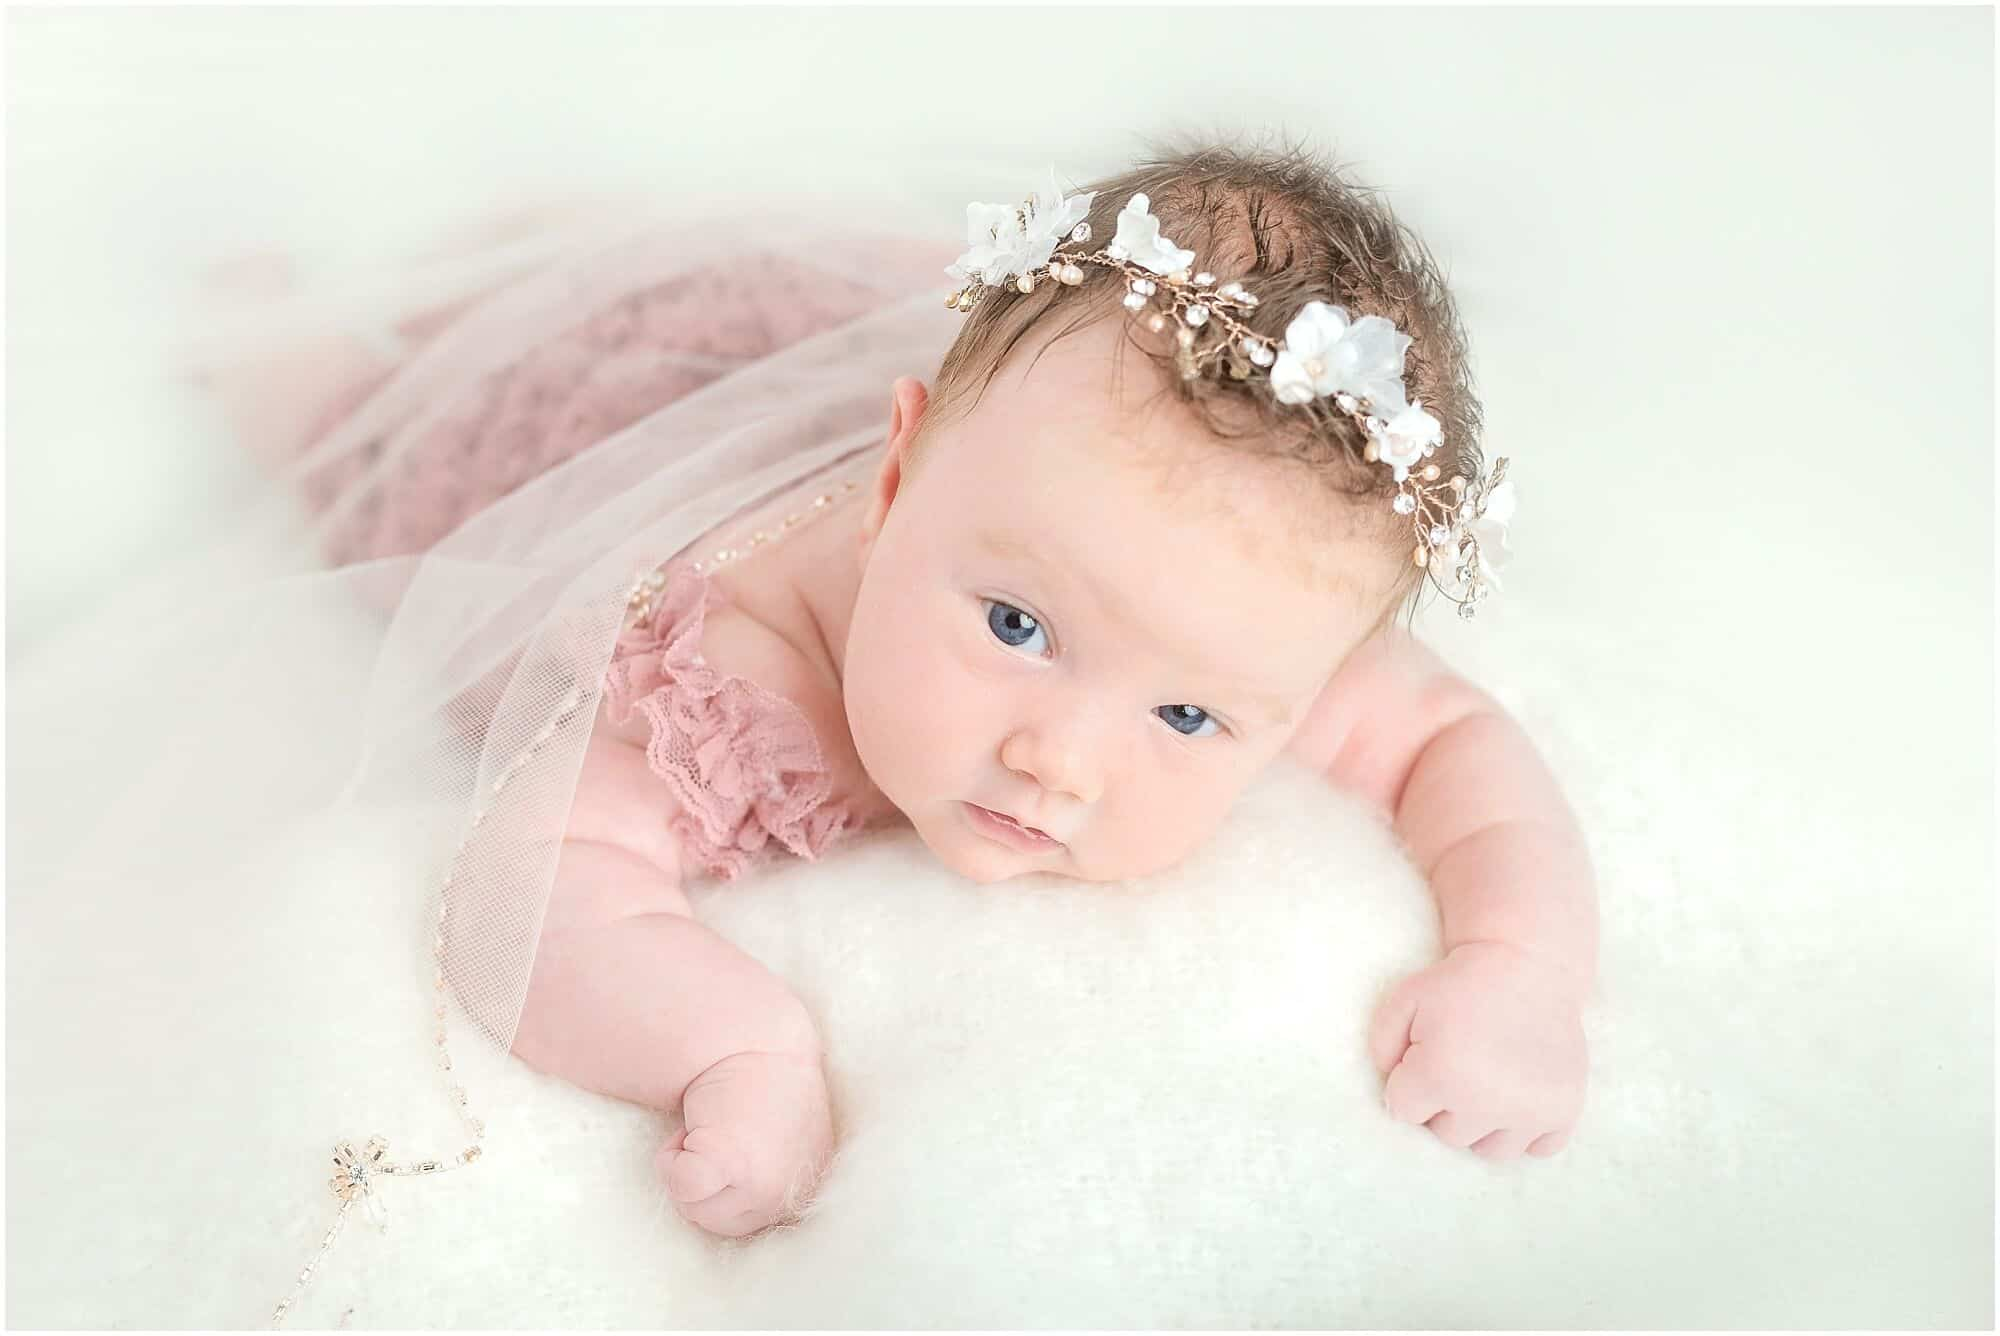 baby girl mom's veil ashland mansfield ohio baby photographer tiffany murray